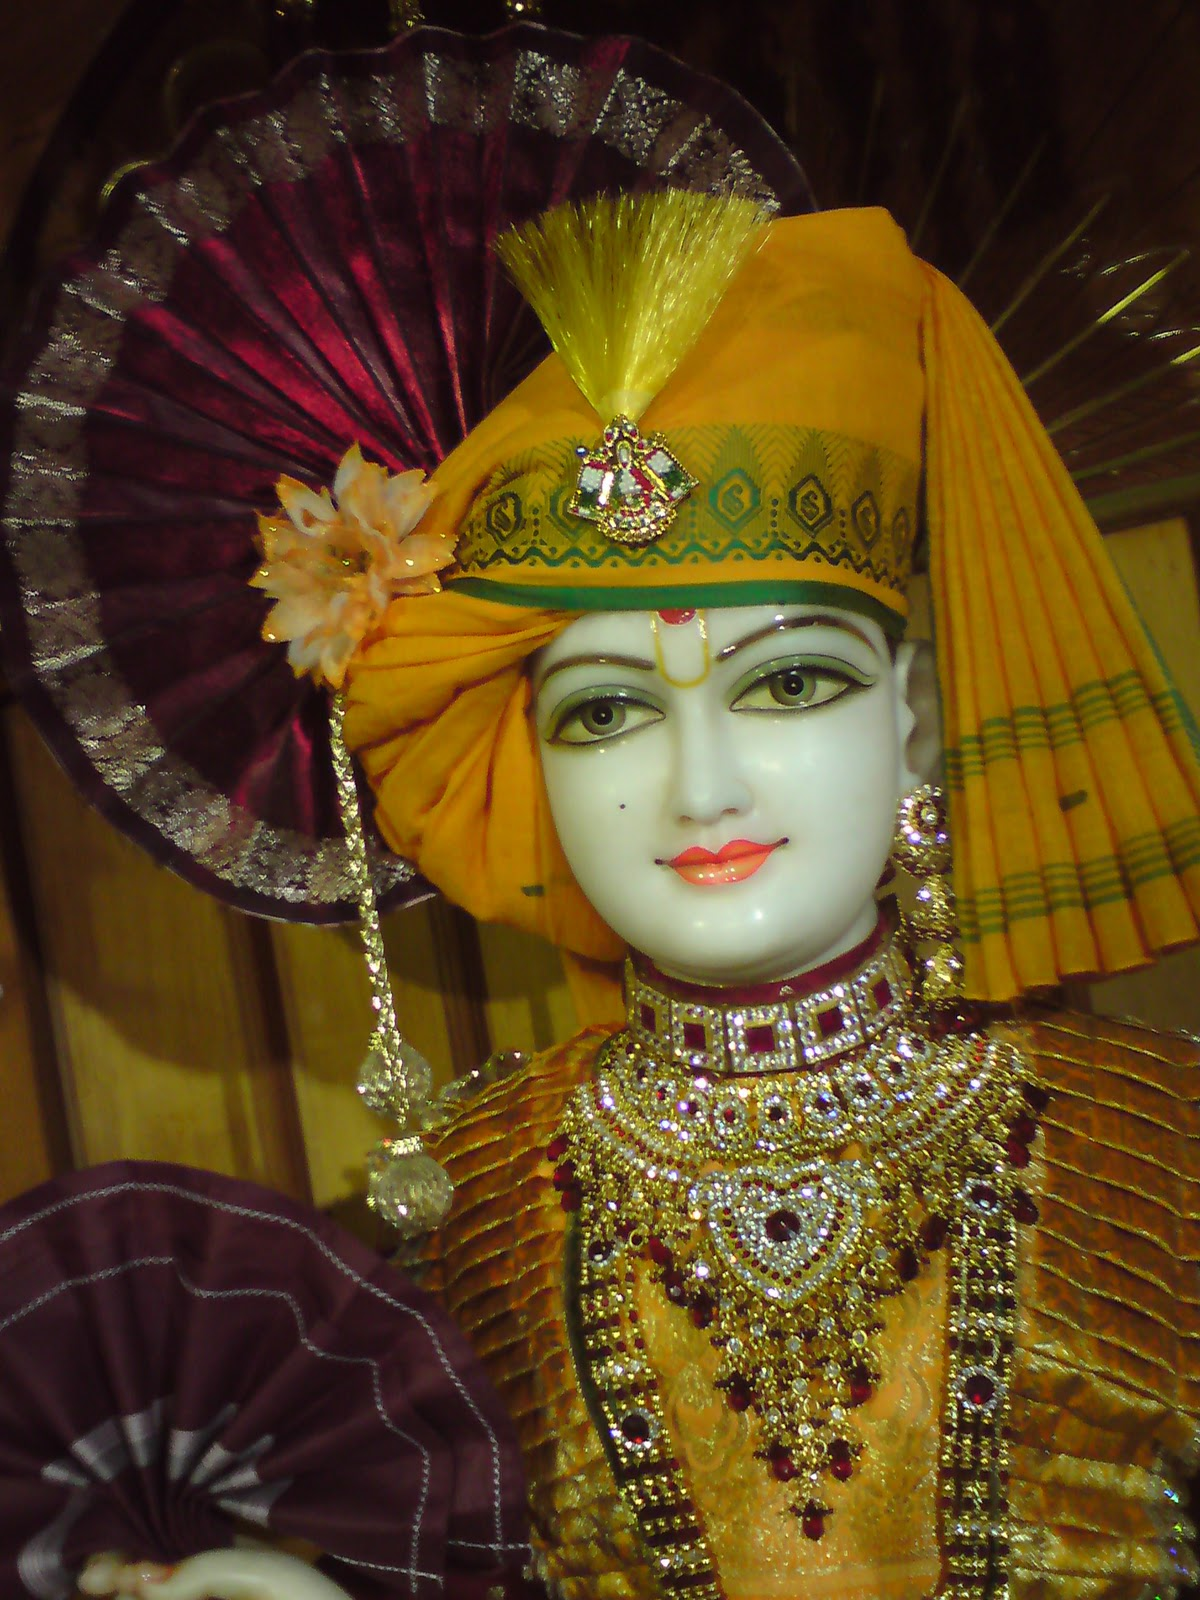 Baps Ghanshyam Maharaj Hd Wallpaper 11 Lord Swaminarayan Wallpaper